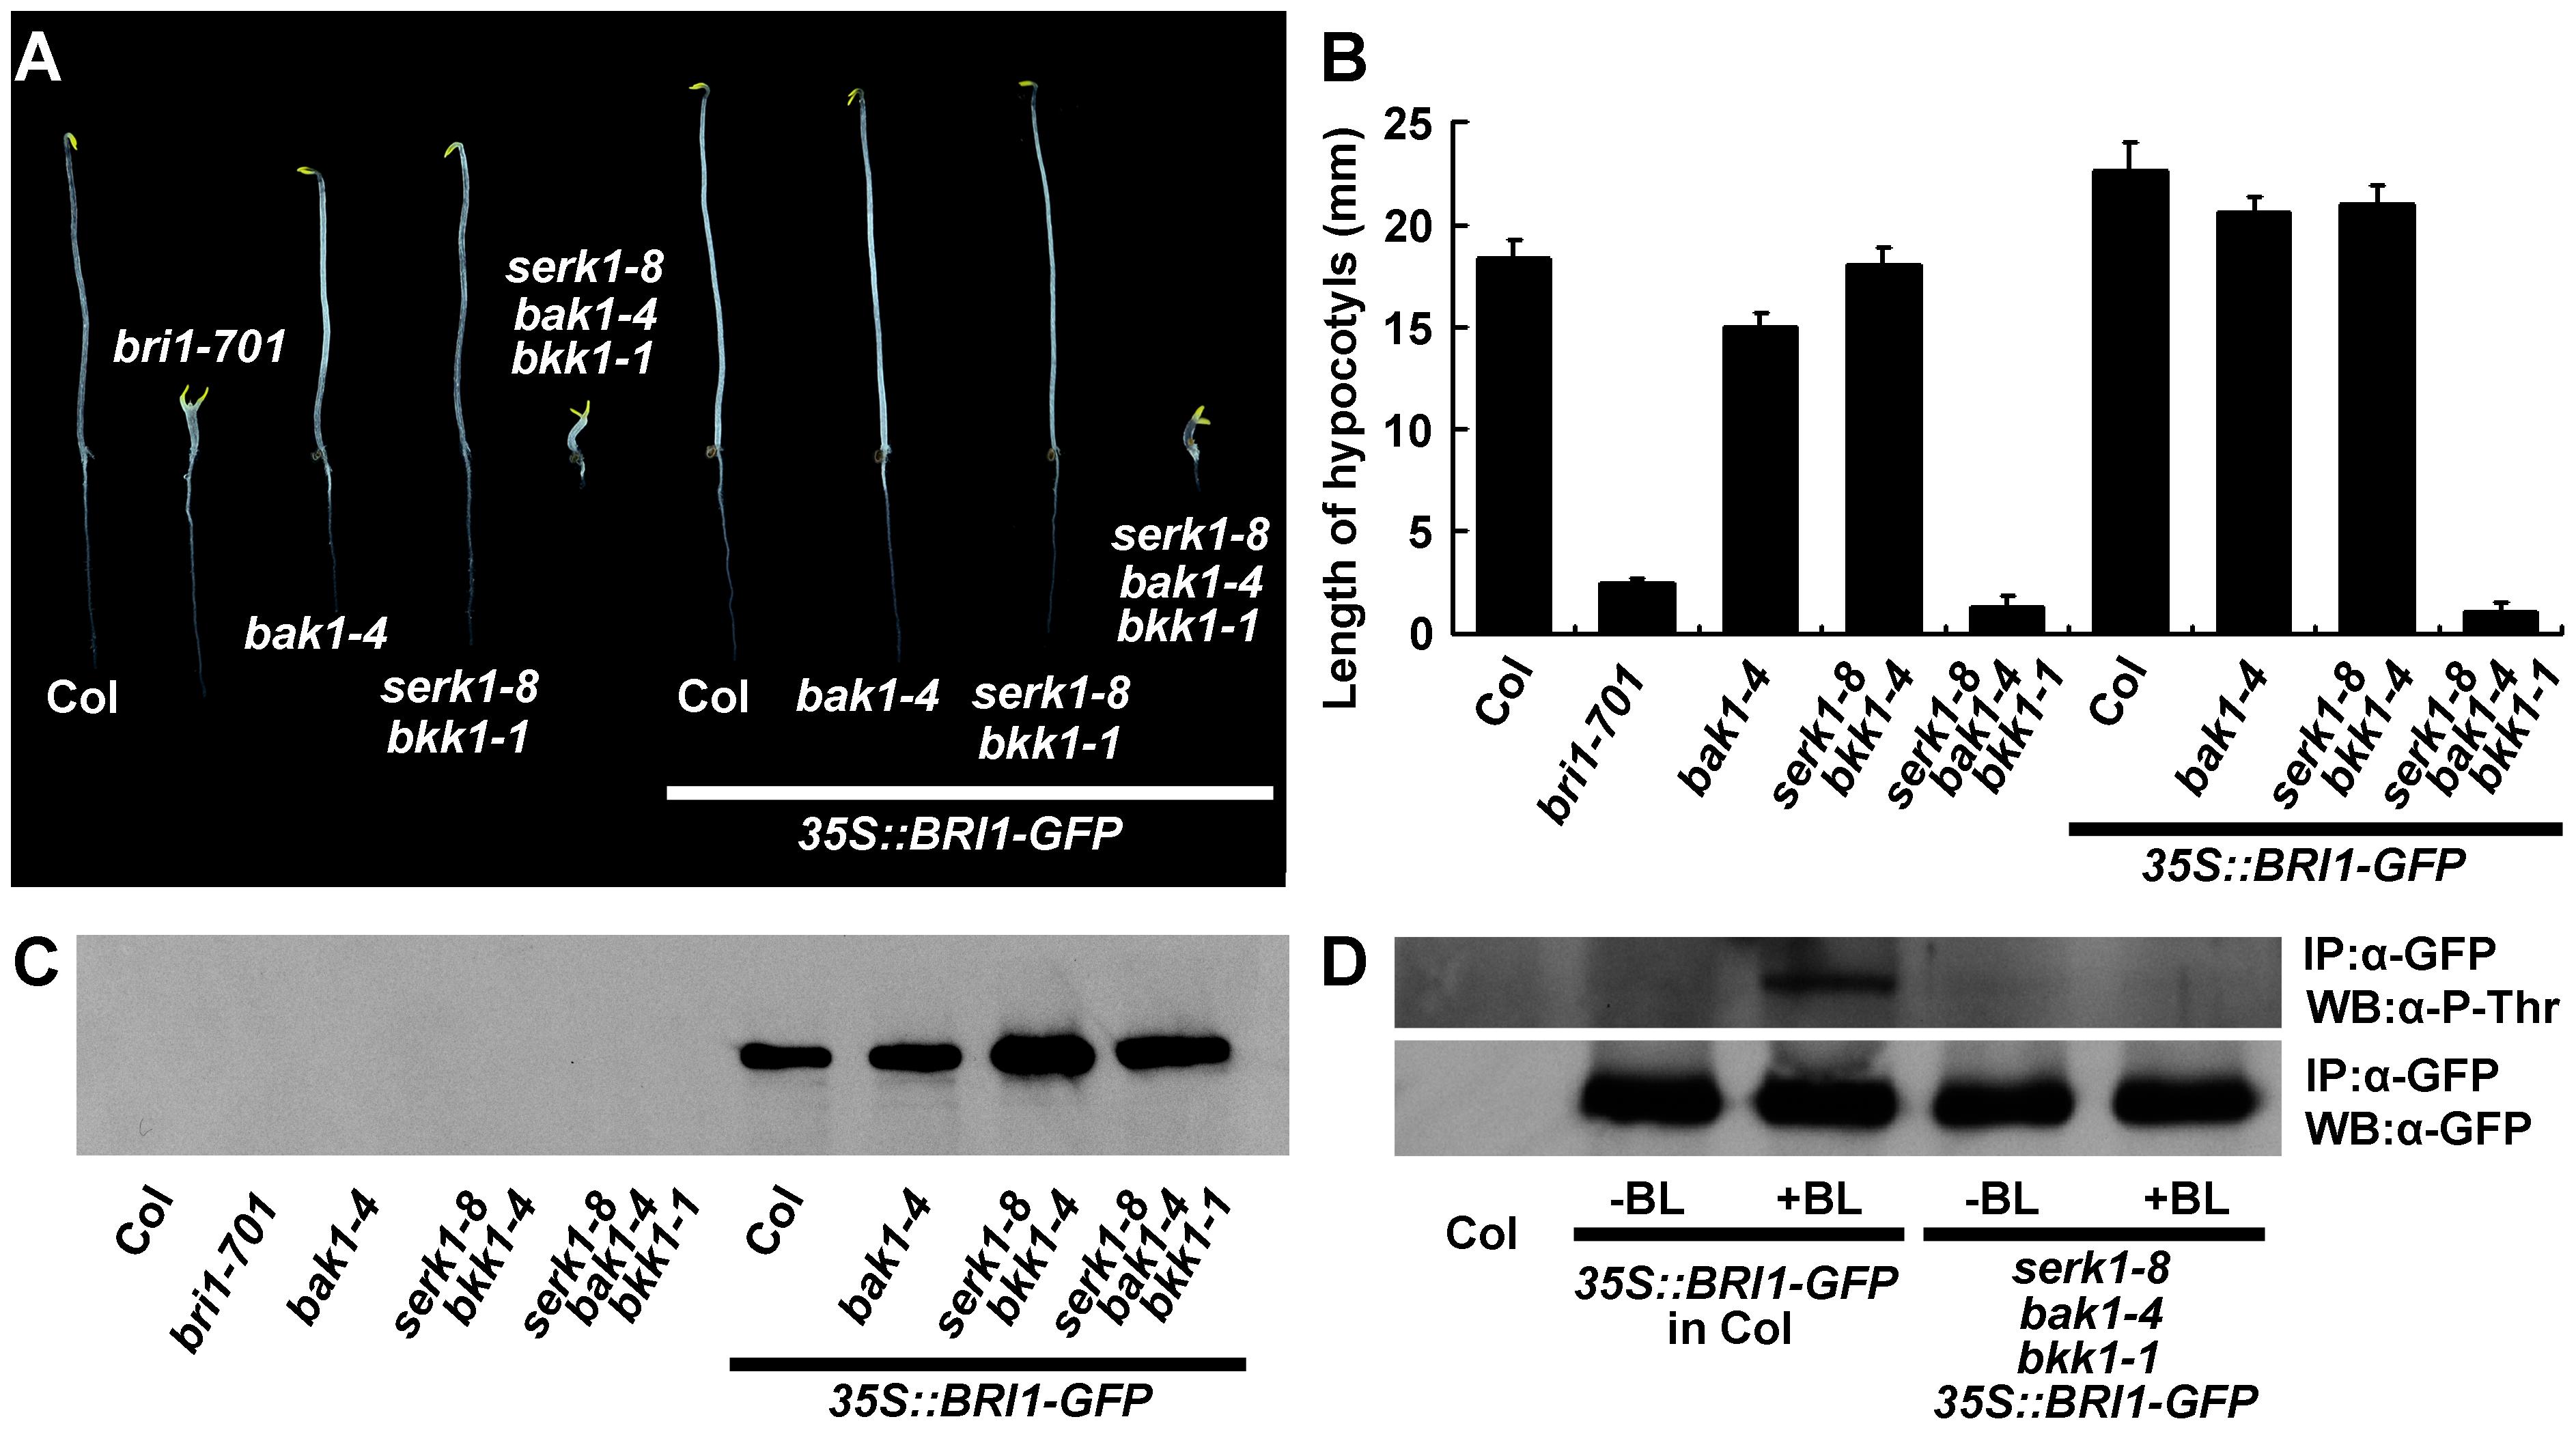 Overexpression of <i>BRI1</i> dramatically increases hypocotyl growth of wild type but does not promote hypocotyl growth of <i>serk1-8 bak1-4 bkk1-1</i>.